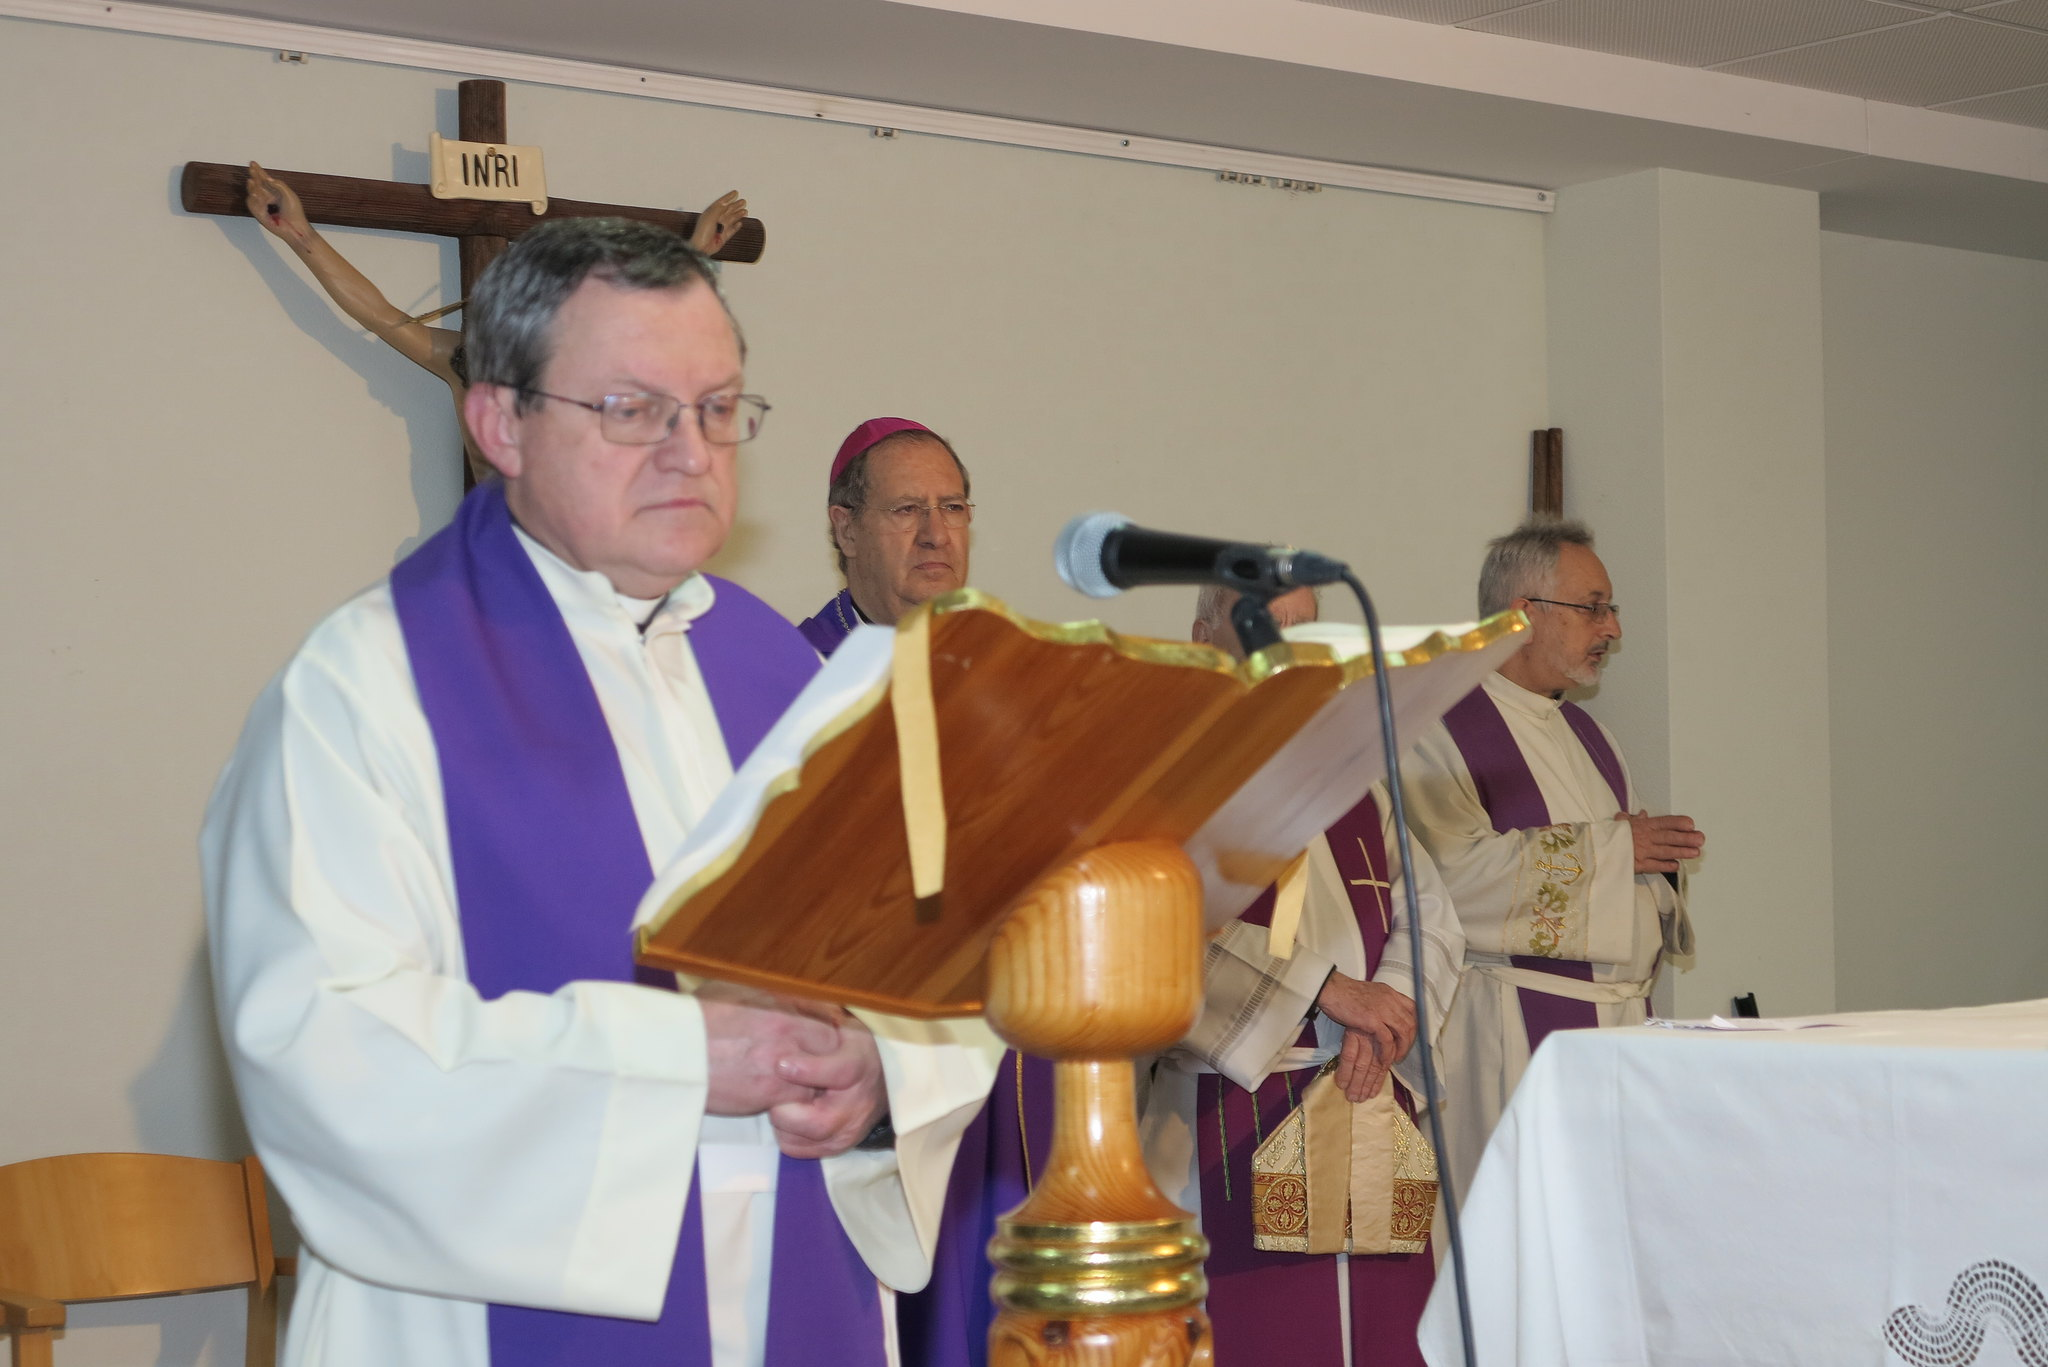 (2016-02-13) - Inauguración Virgen de Lourdes, La Molineta - Archivo La Molineta 2 (06)